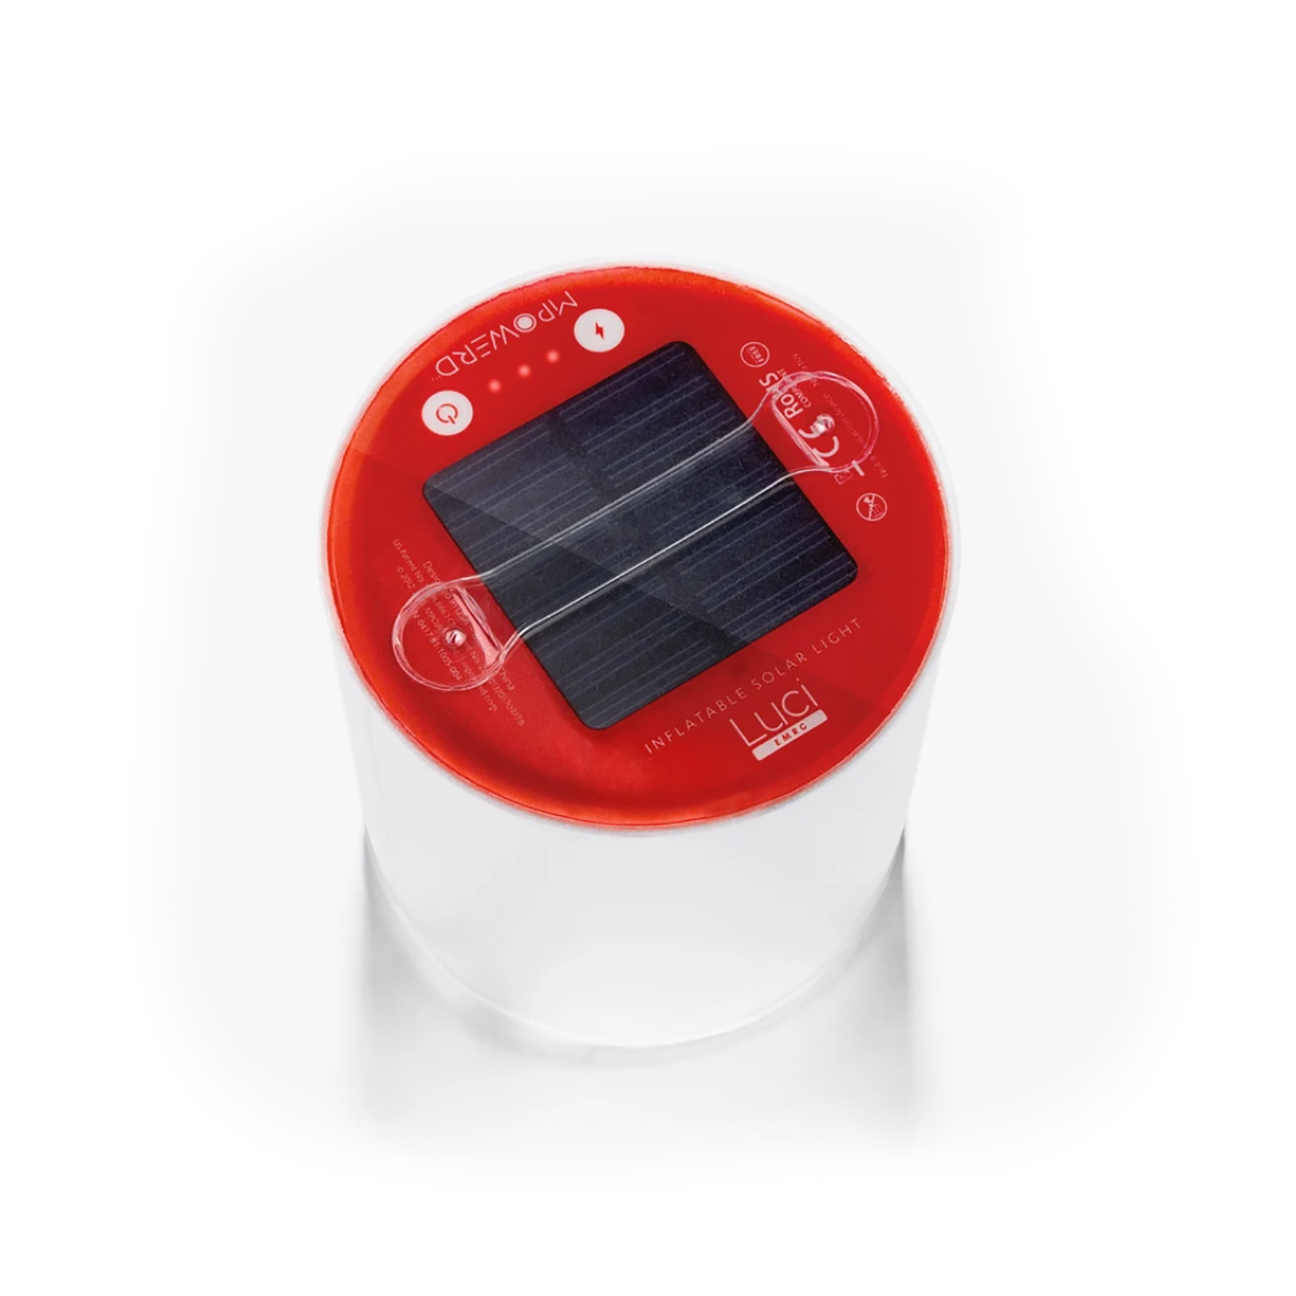 Luci EMRG Inflatable Solar Light-1